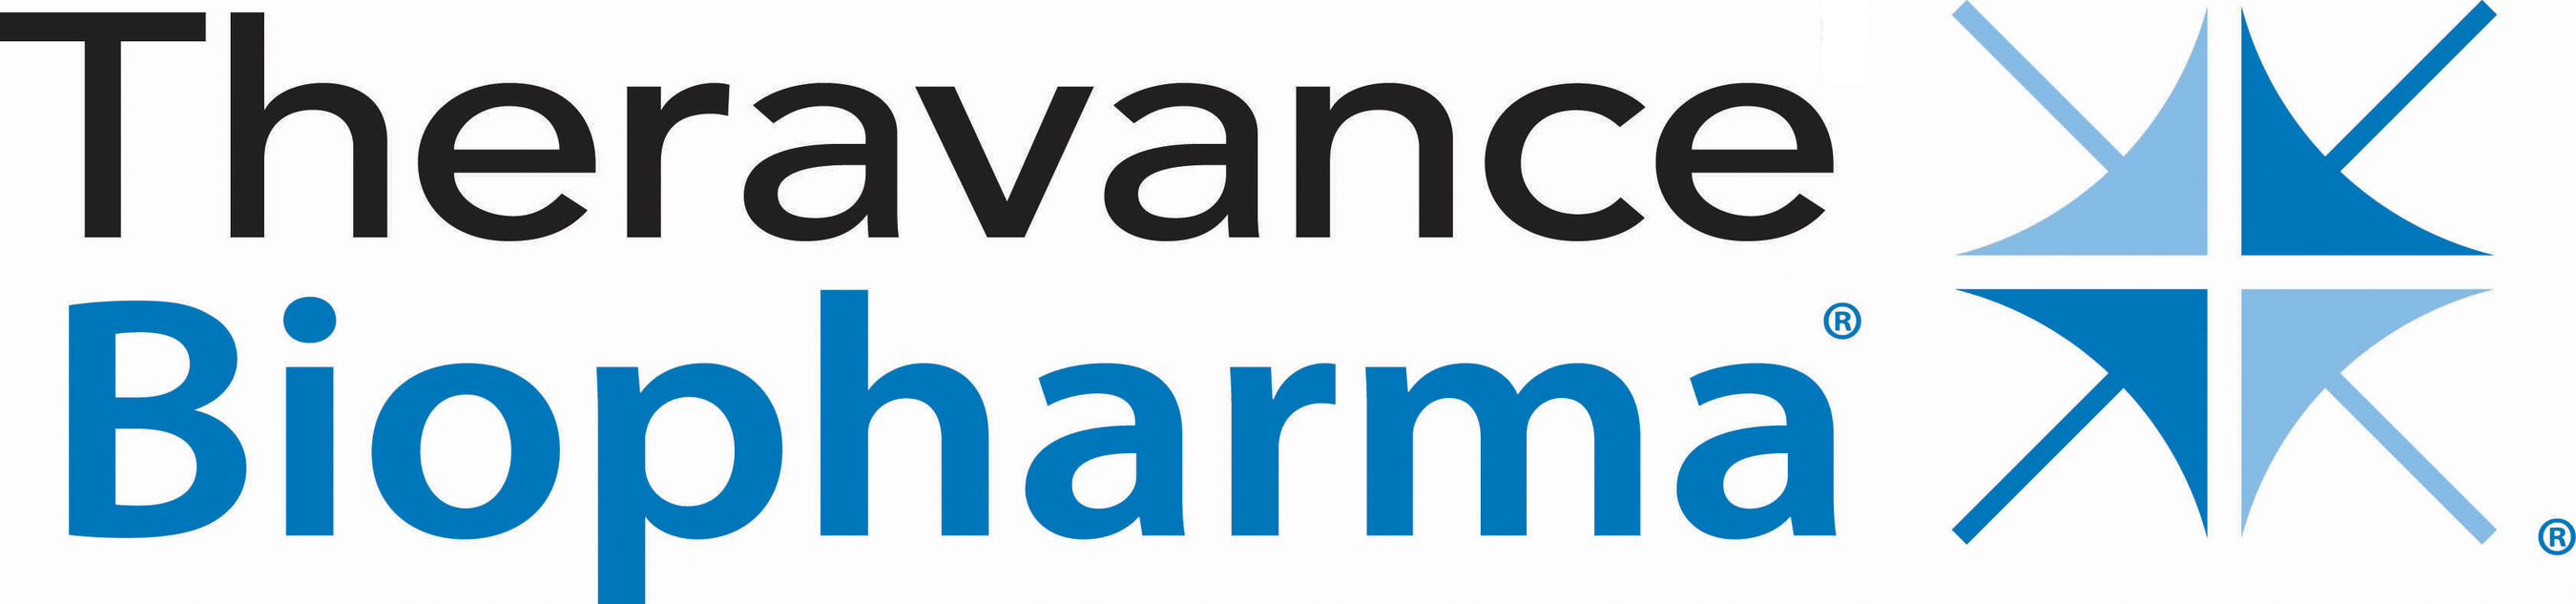 (PRNewsfoto/Theravance Biopharma, Inc.)